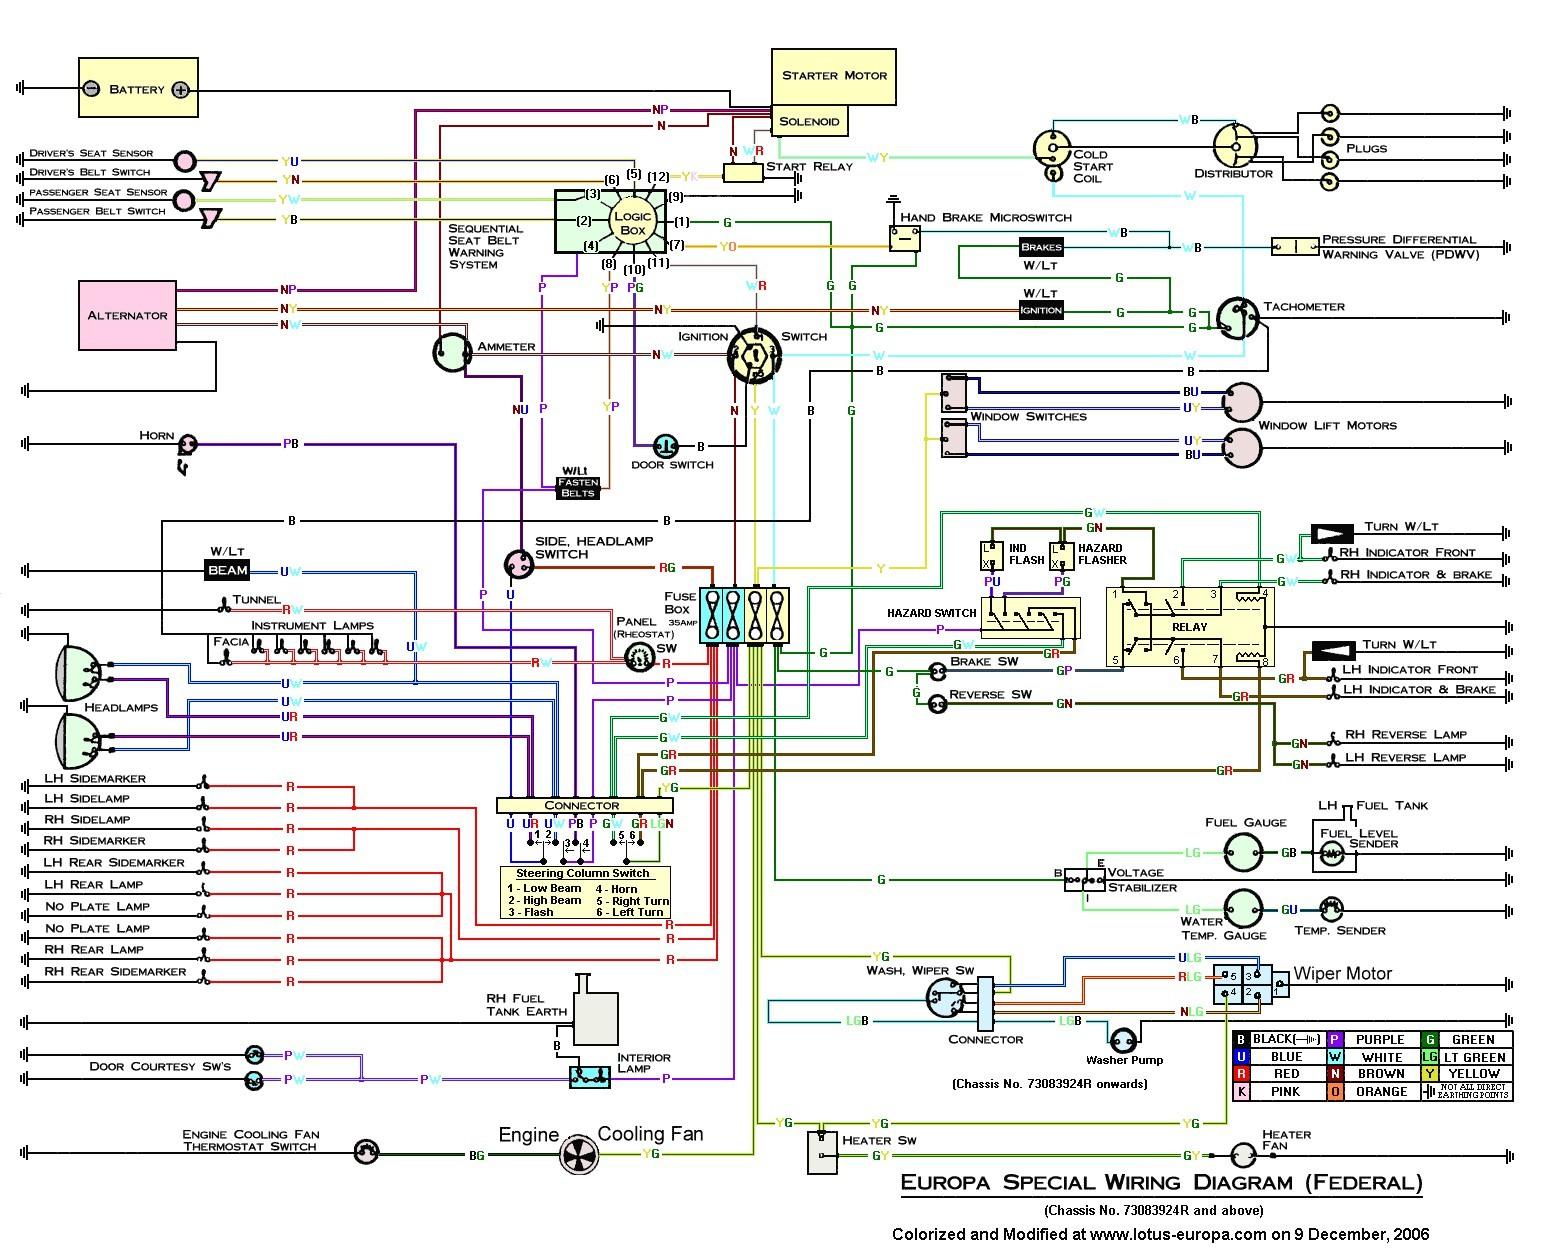 jvc car stereo wiring harness jvc kd radio wiring harness diagram wiring diagram data  jvc kd radio wiring harness diagram